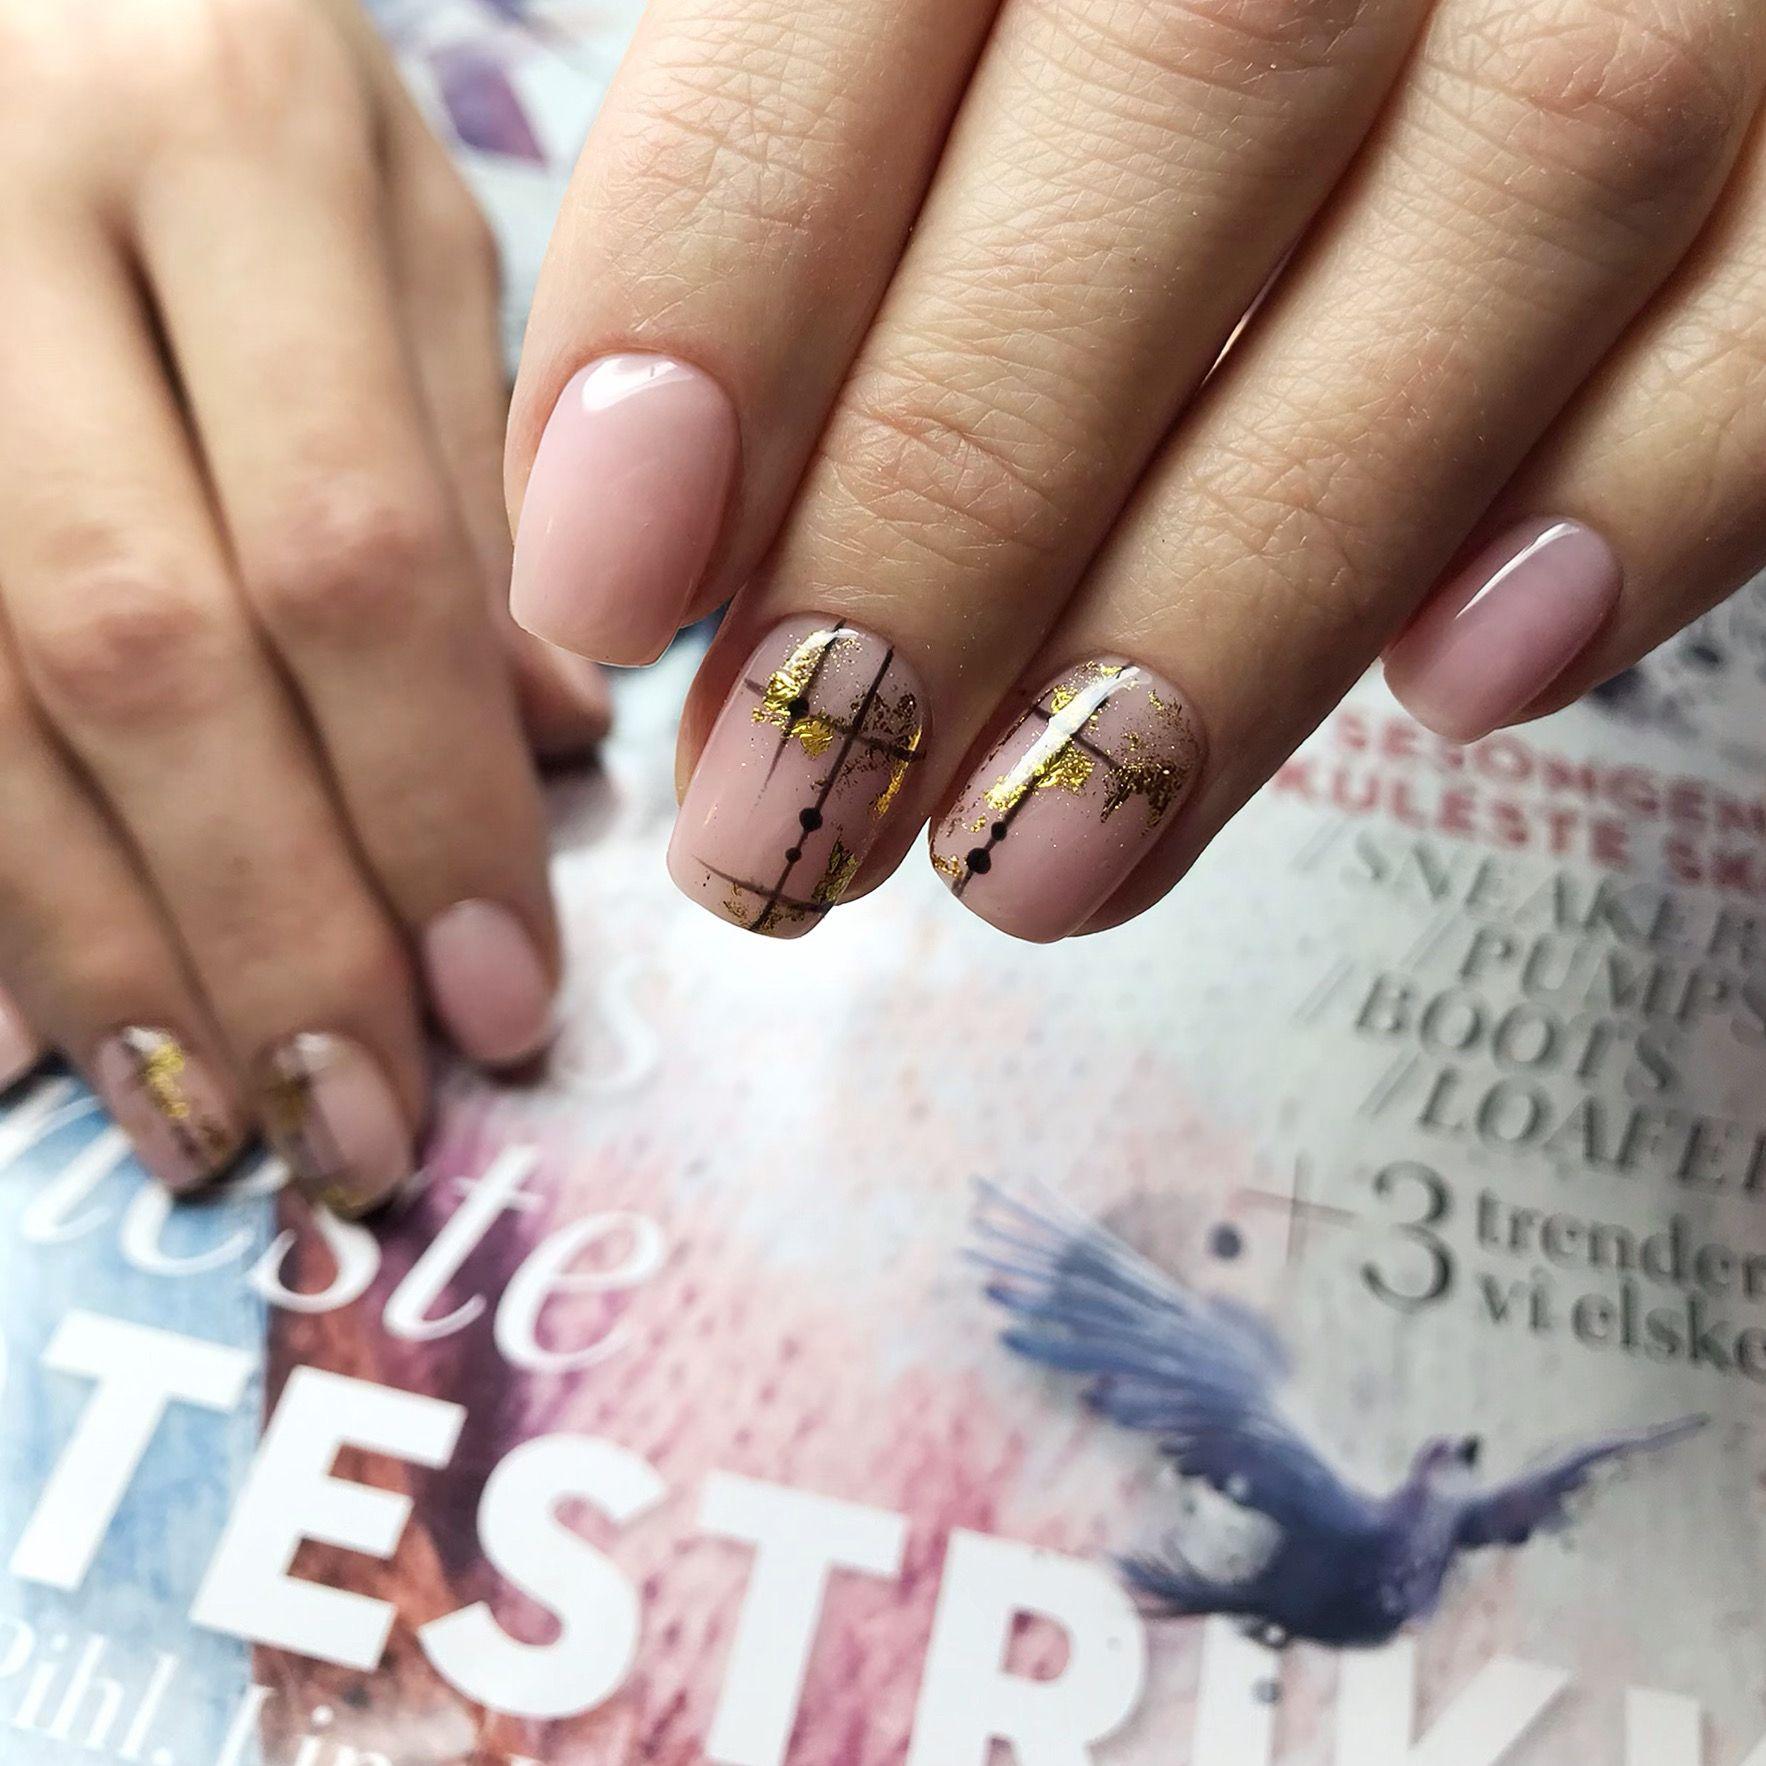 Oslo Manikyr in 2020   Nails, Esthetics, Beauty